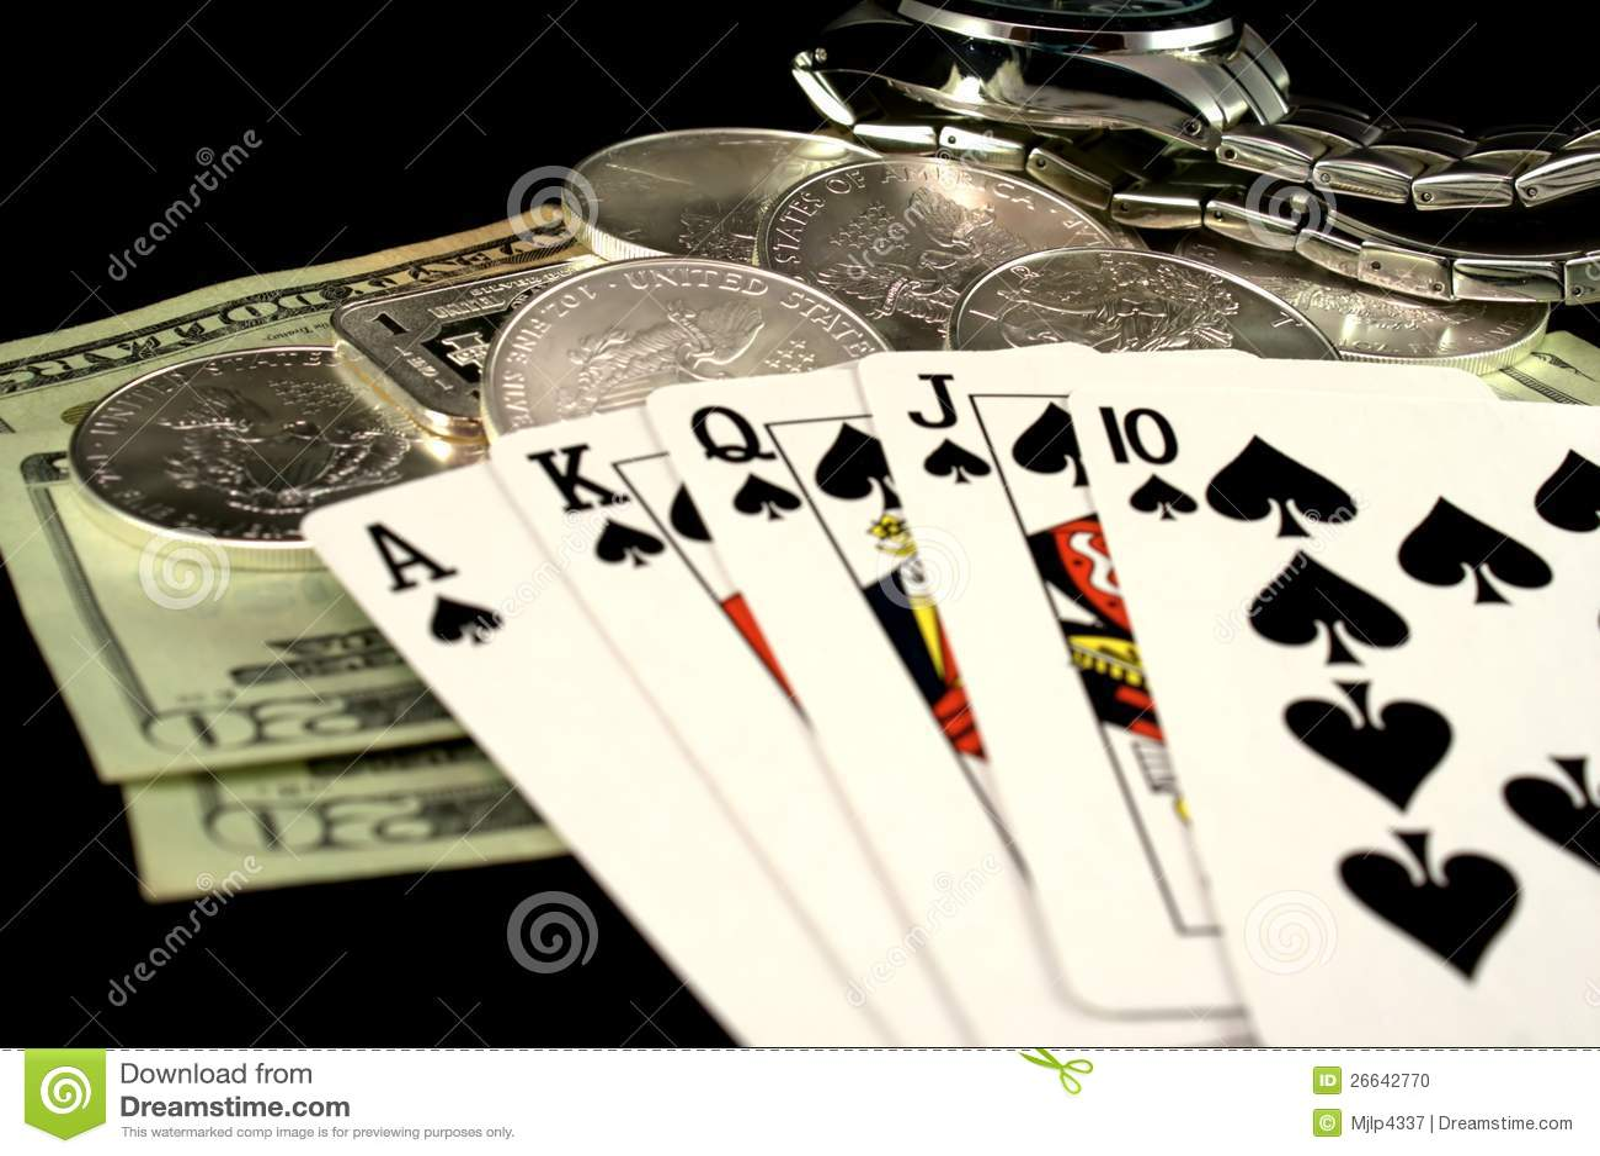 royal vegas online casino download jackpot online